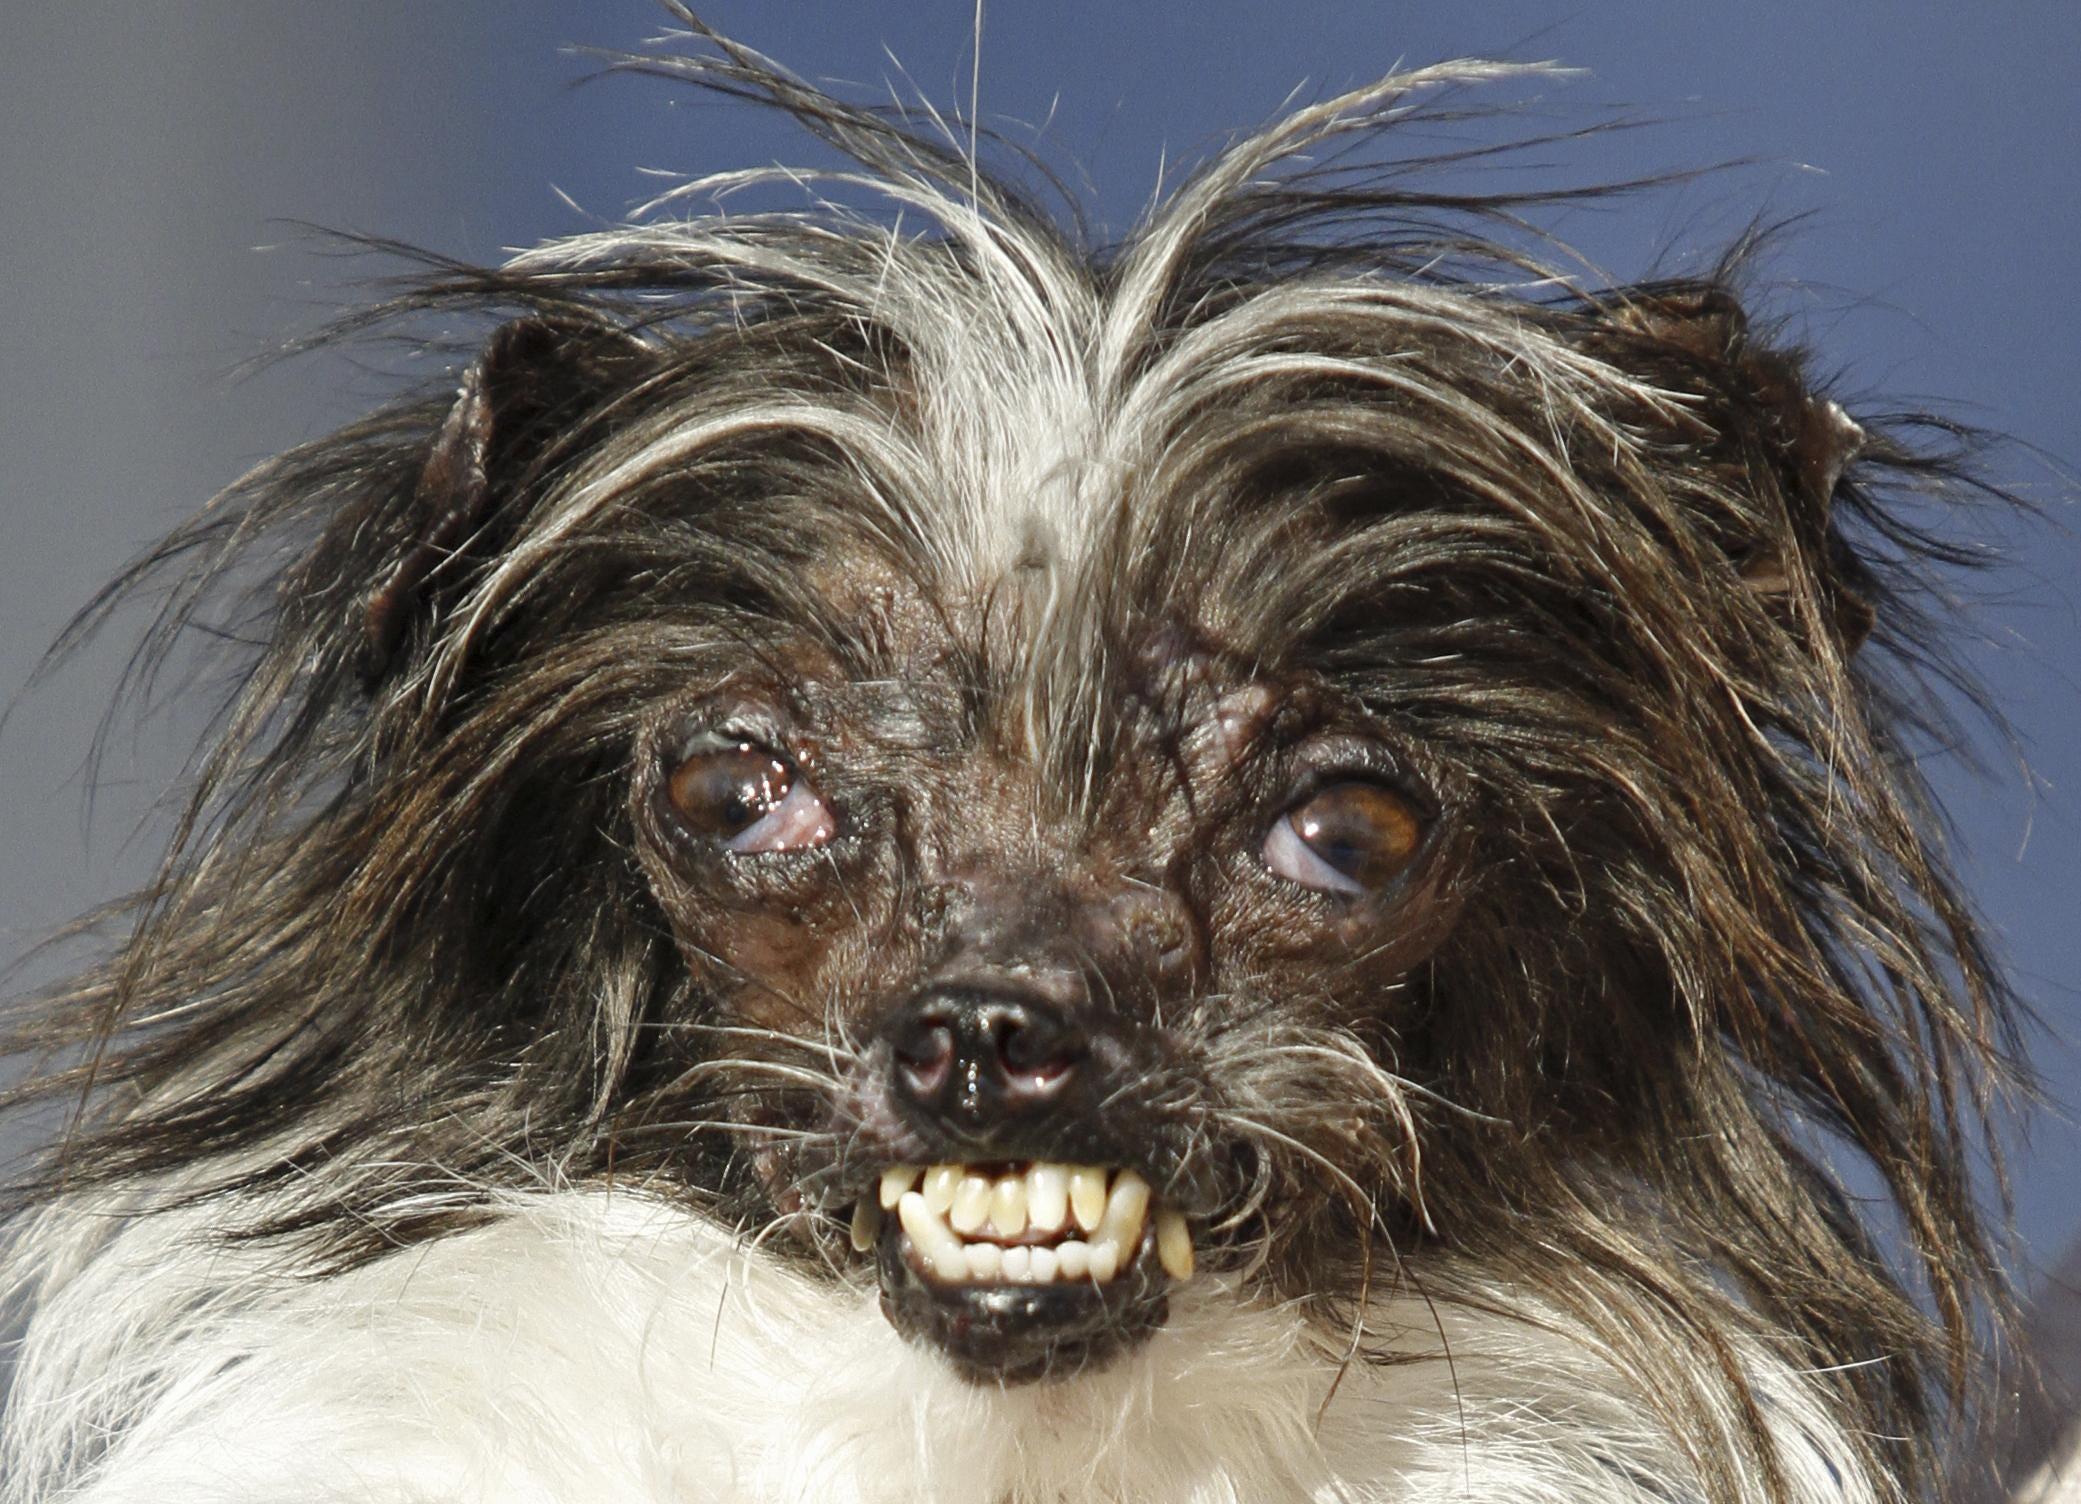 World's Ugliest Dog Contest awards inner beauty